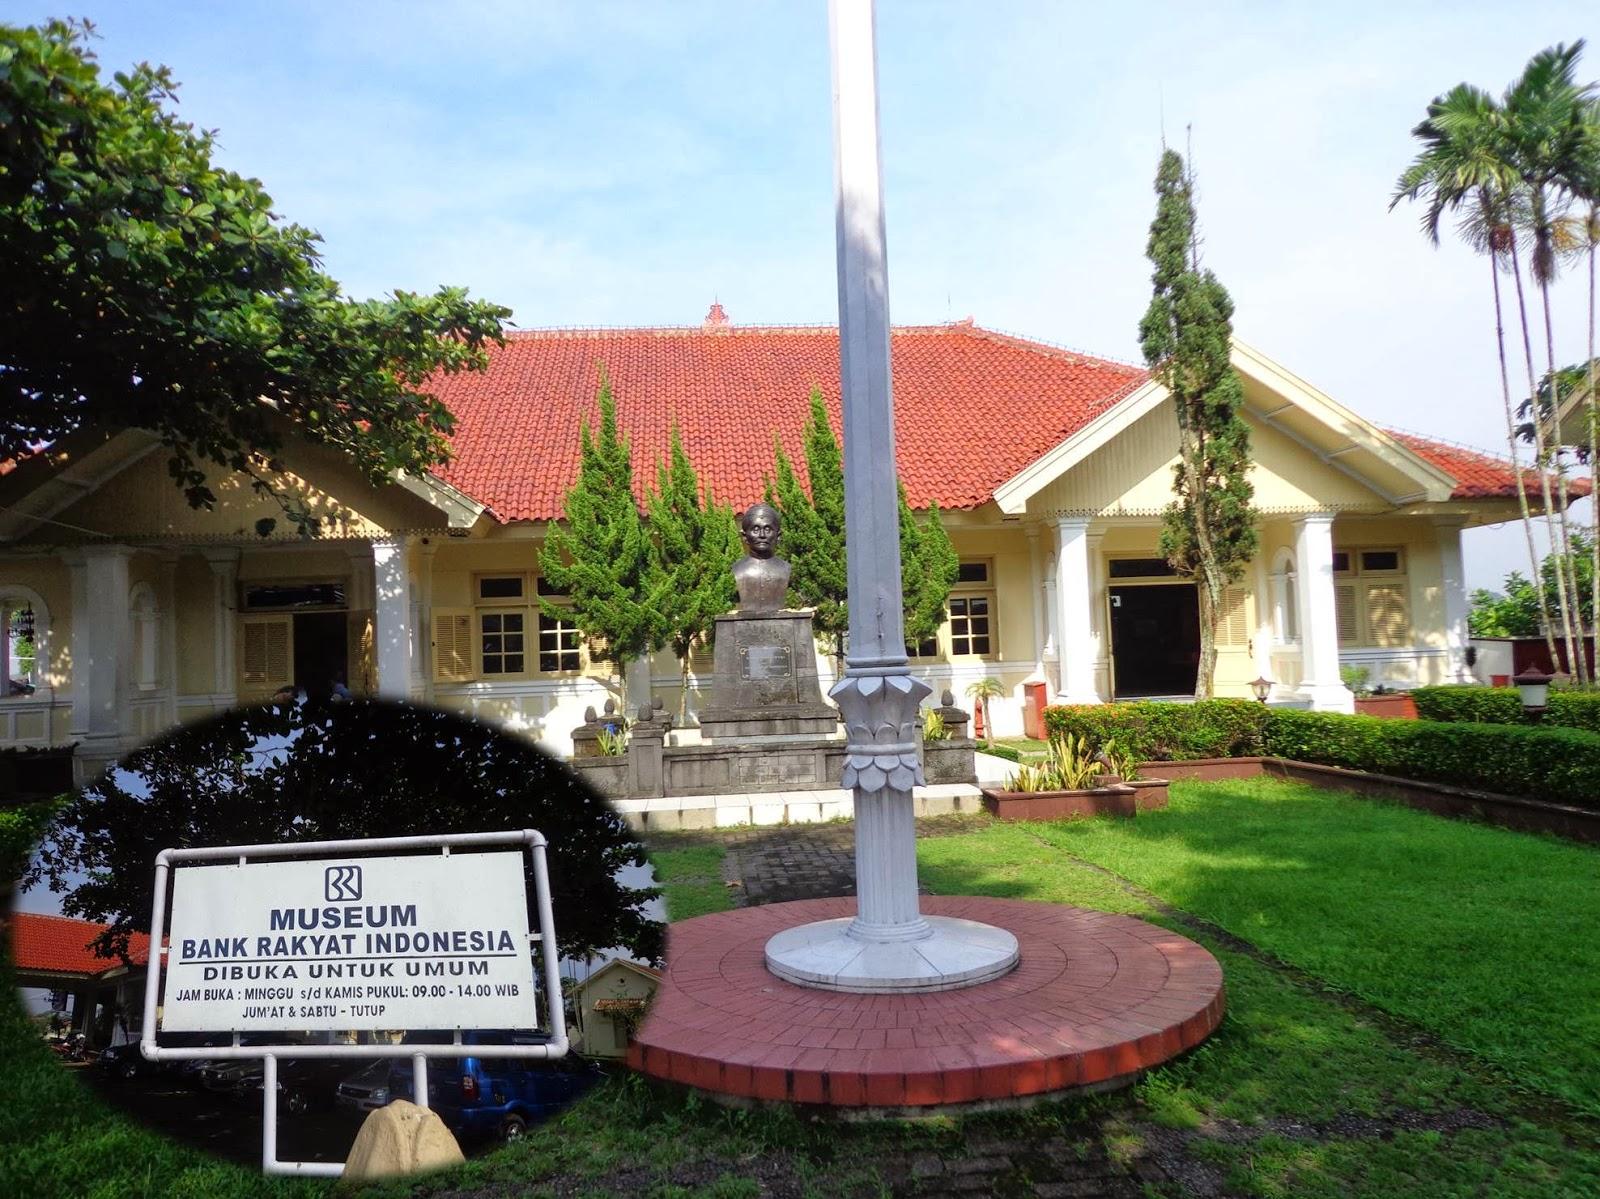 Mi Muhammadiyah Karangtalun Kidul Study Museum Bri Didirikan Purwokerto Kota